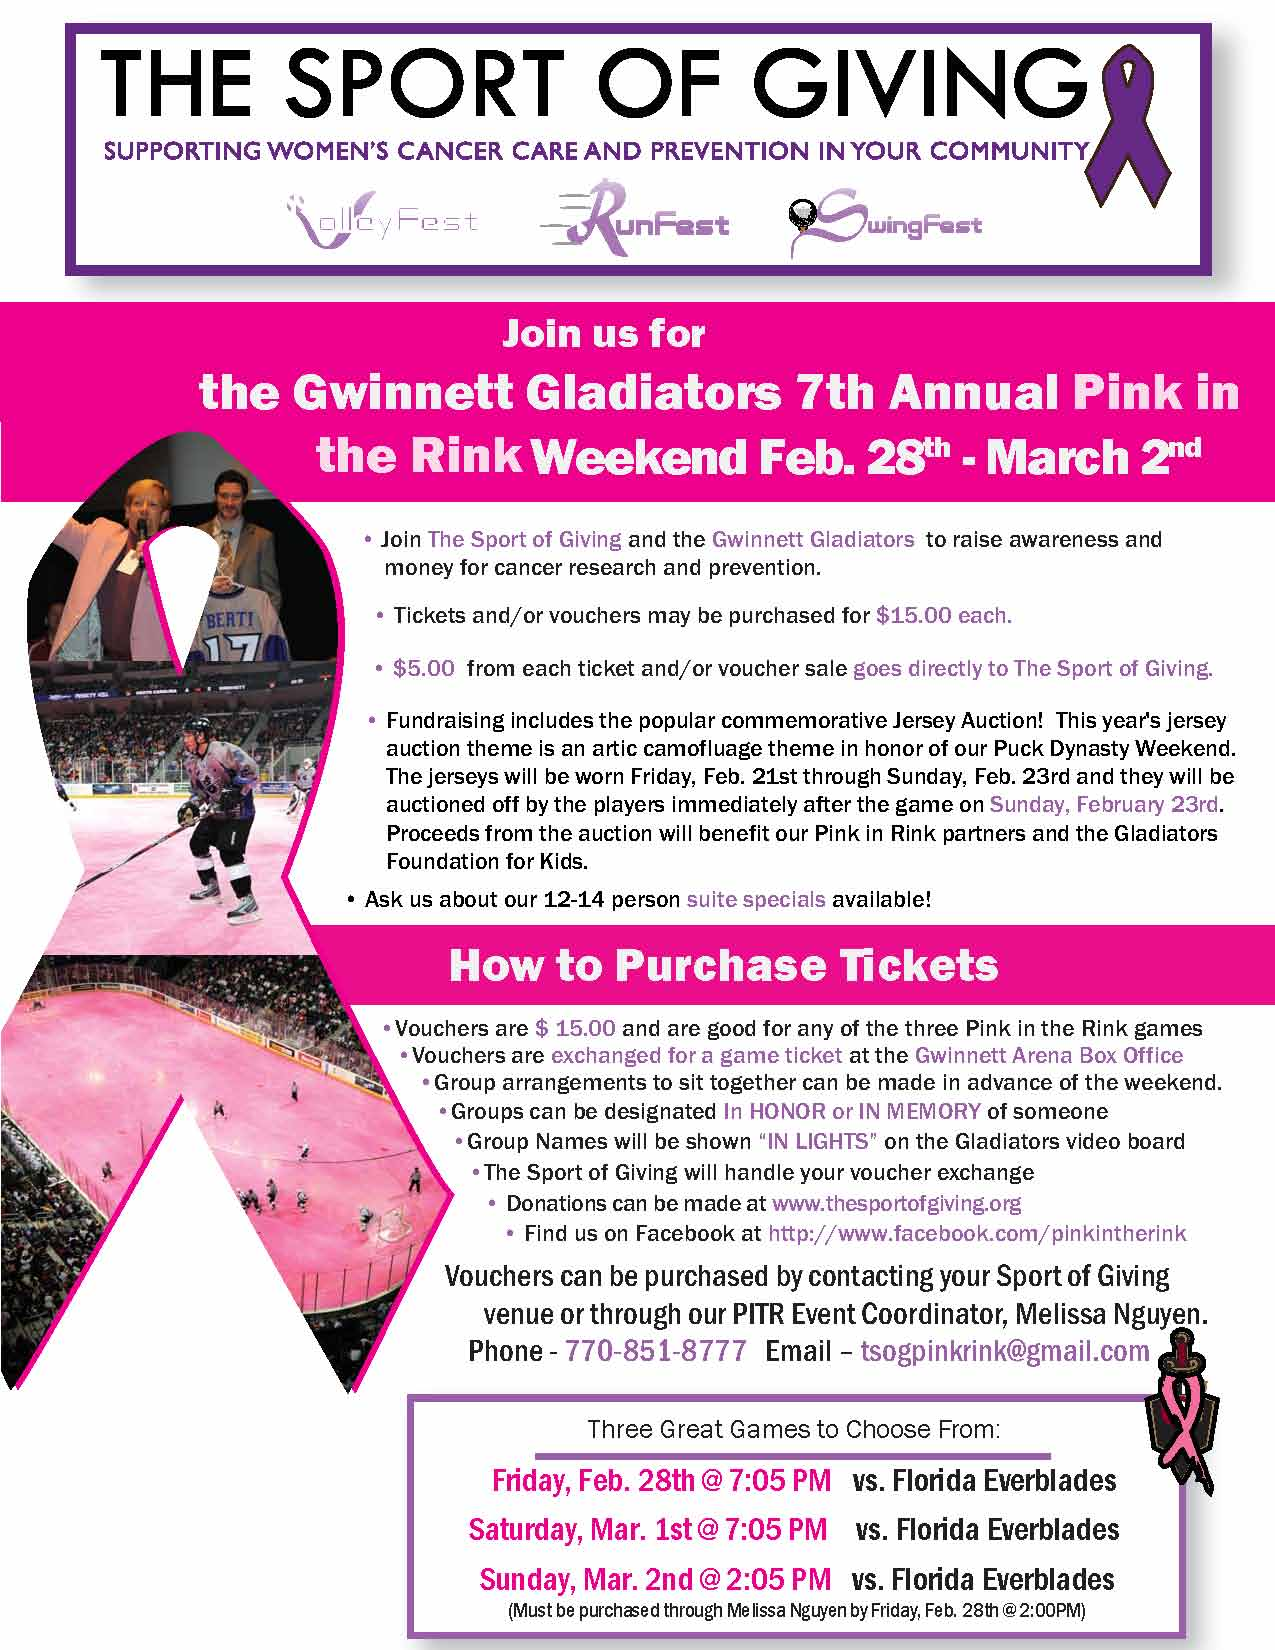 2014 Atlanta Pink in the Rink Information